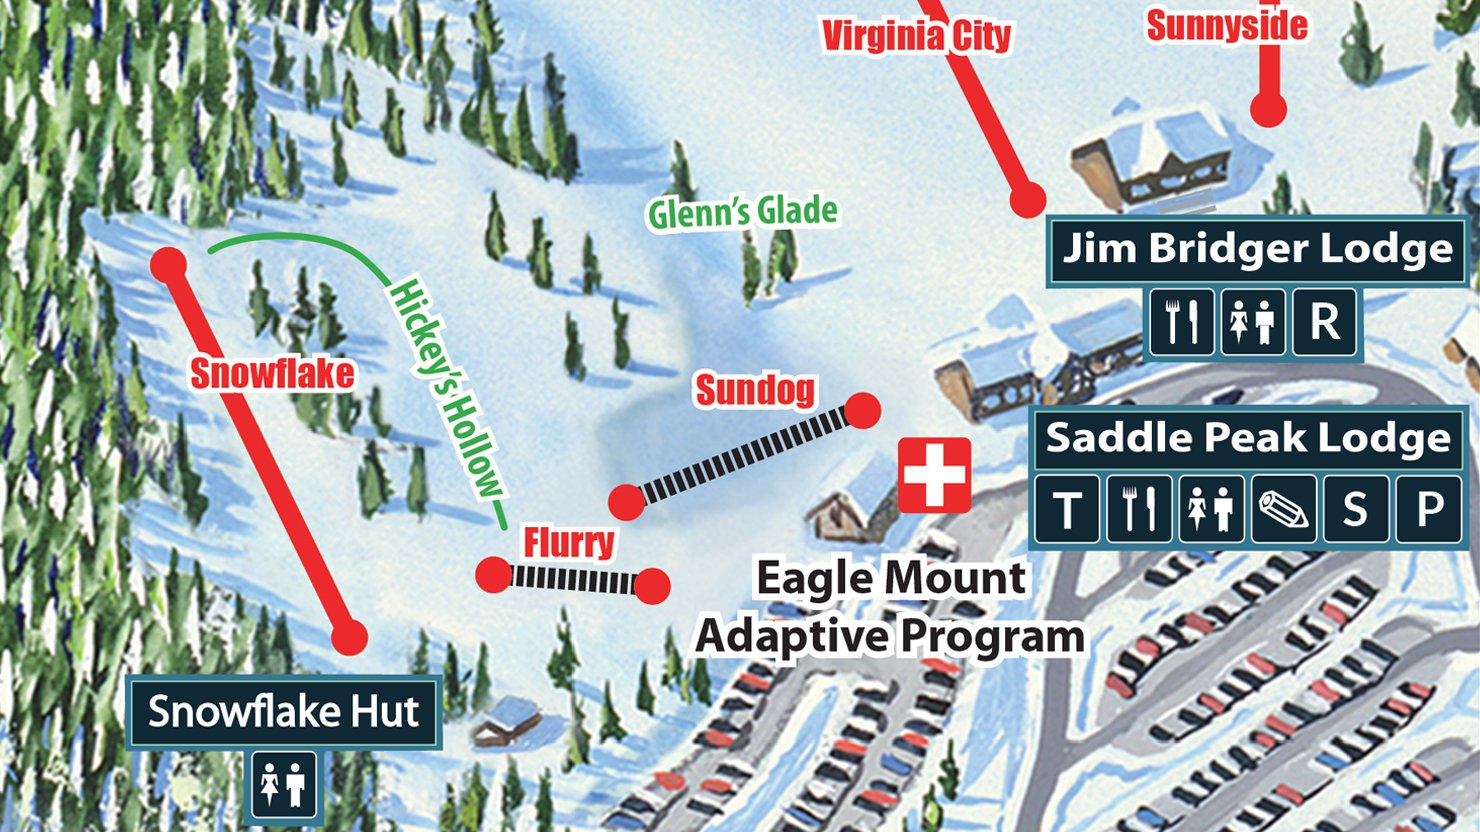 Base Map- Courtesy of www.bridgerbowl.com.